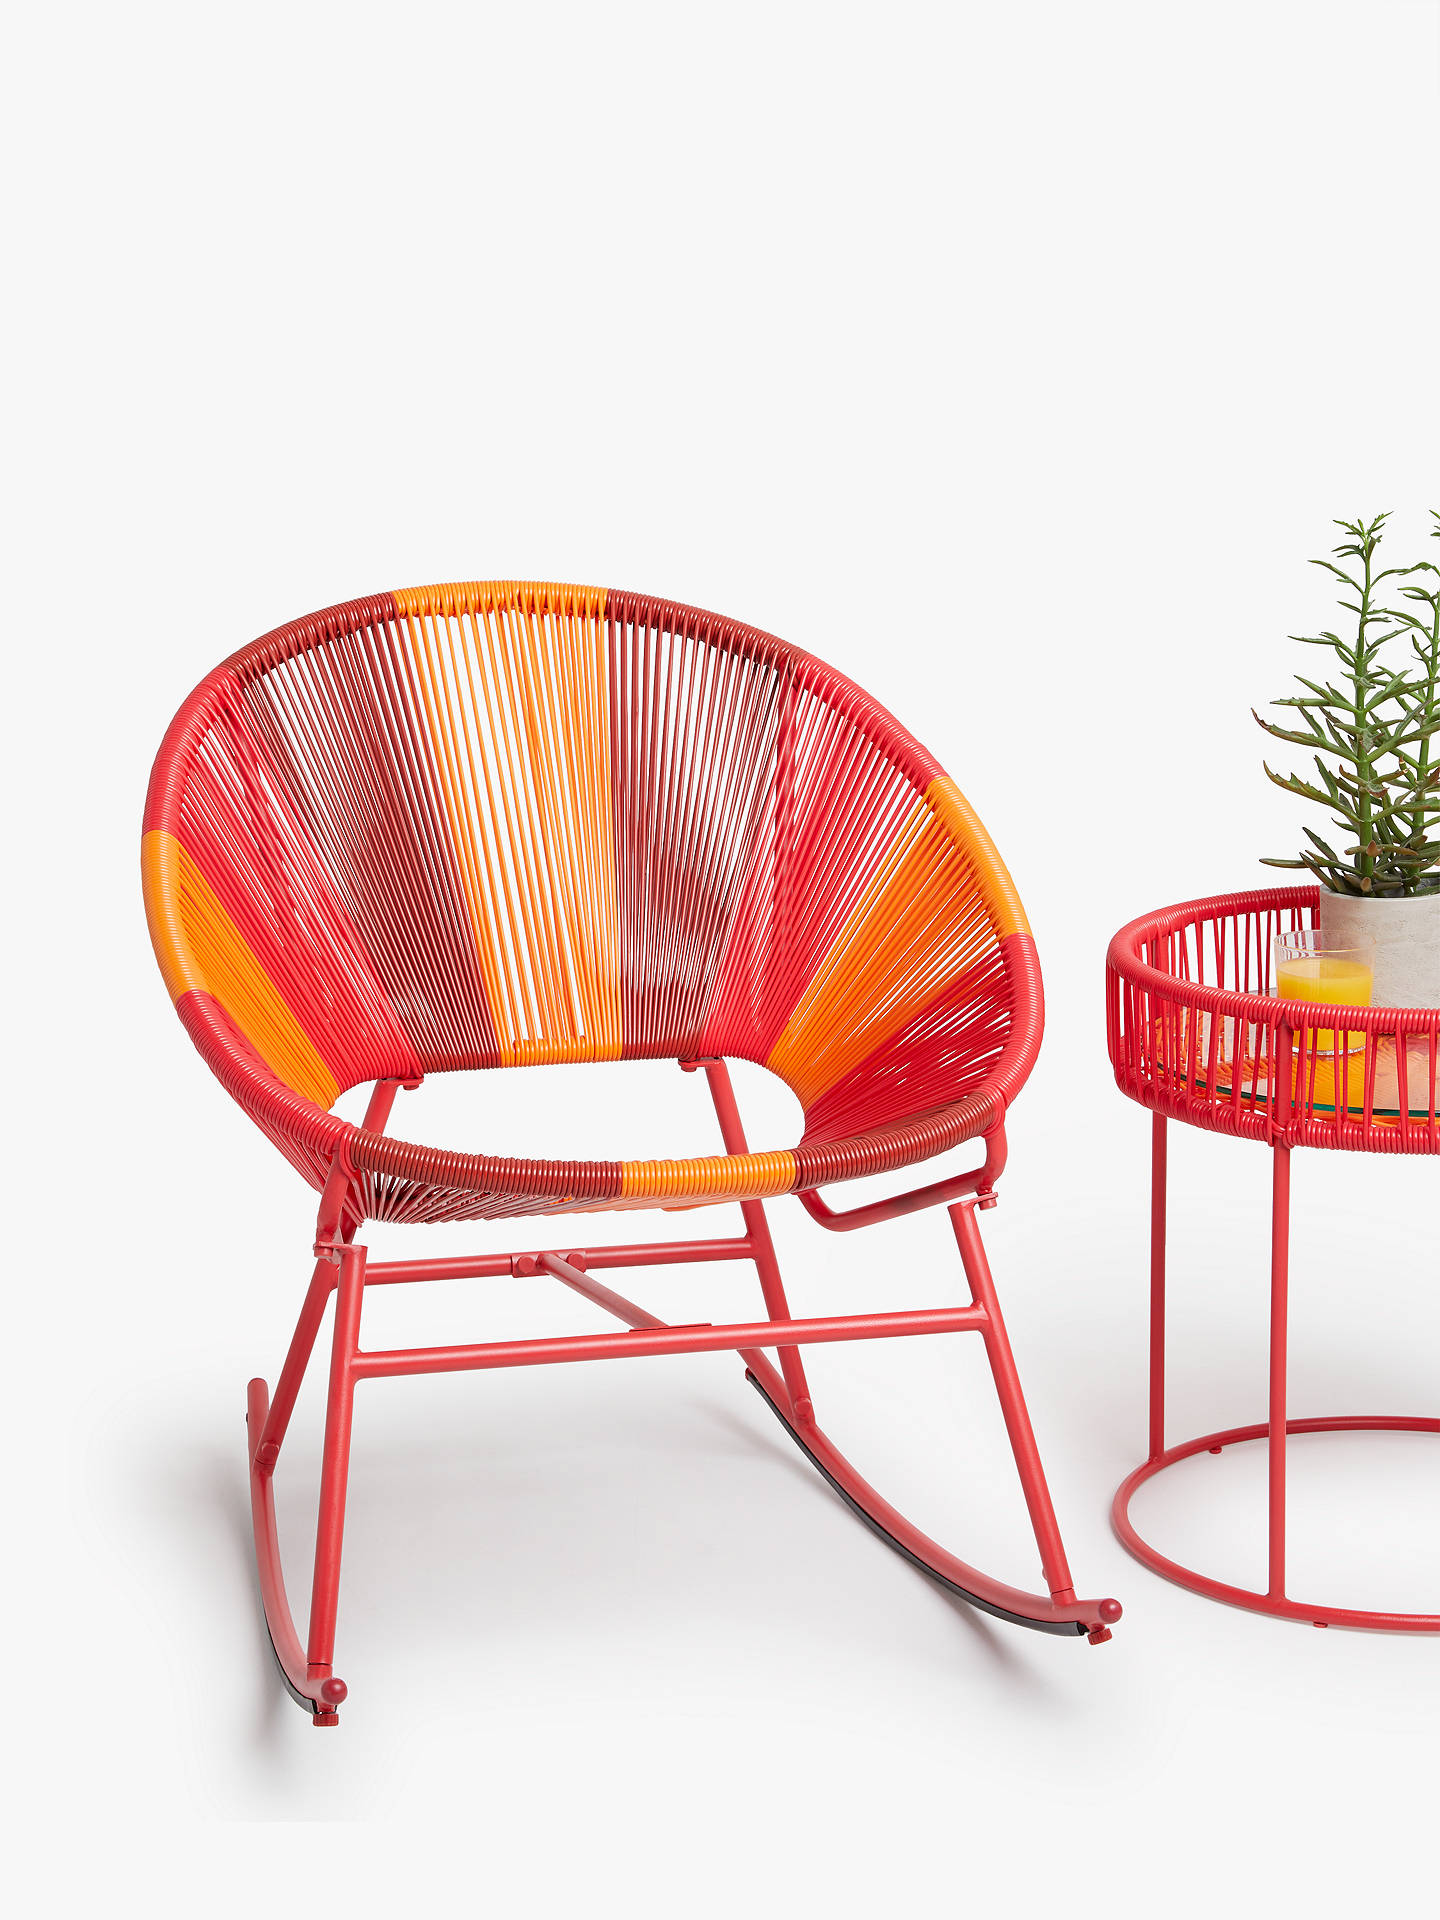 Garden & Patio Furniture Red & Orange Sunrise A John Lewis House